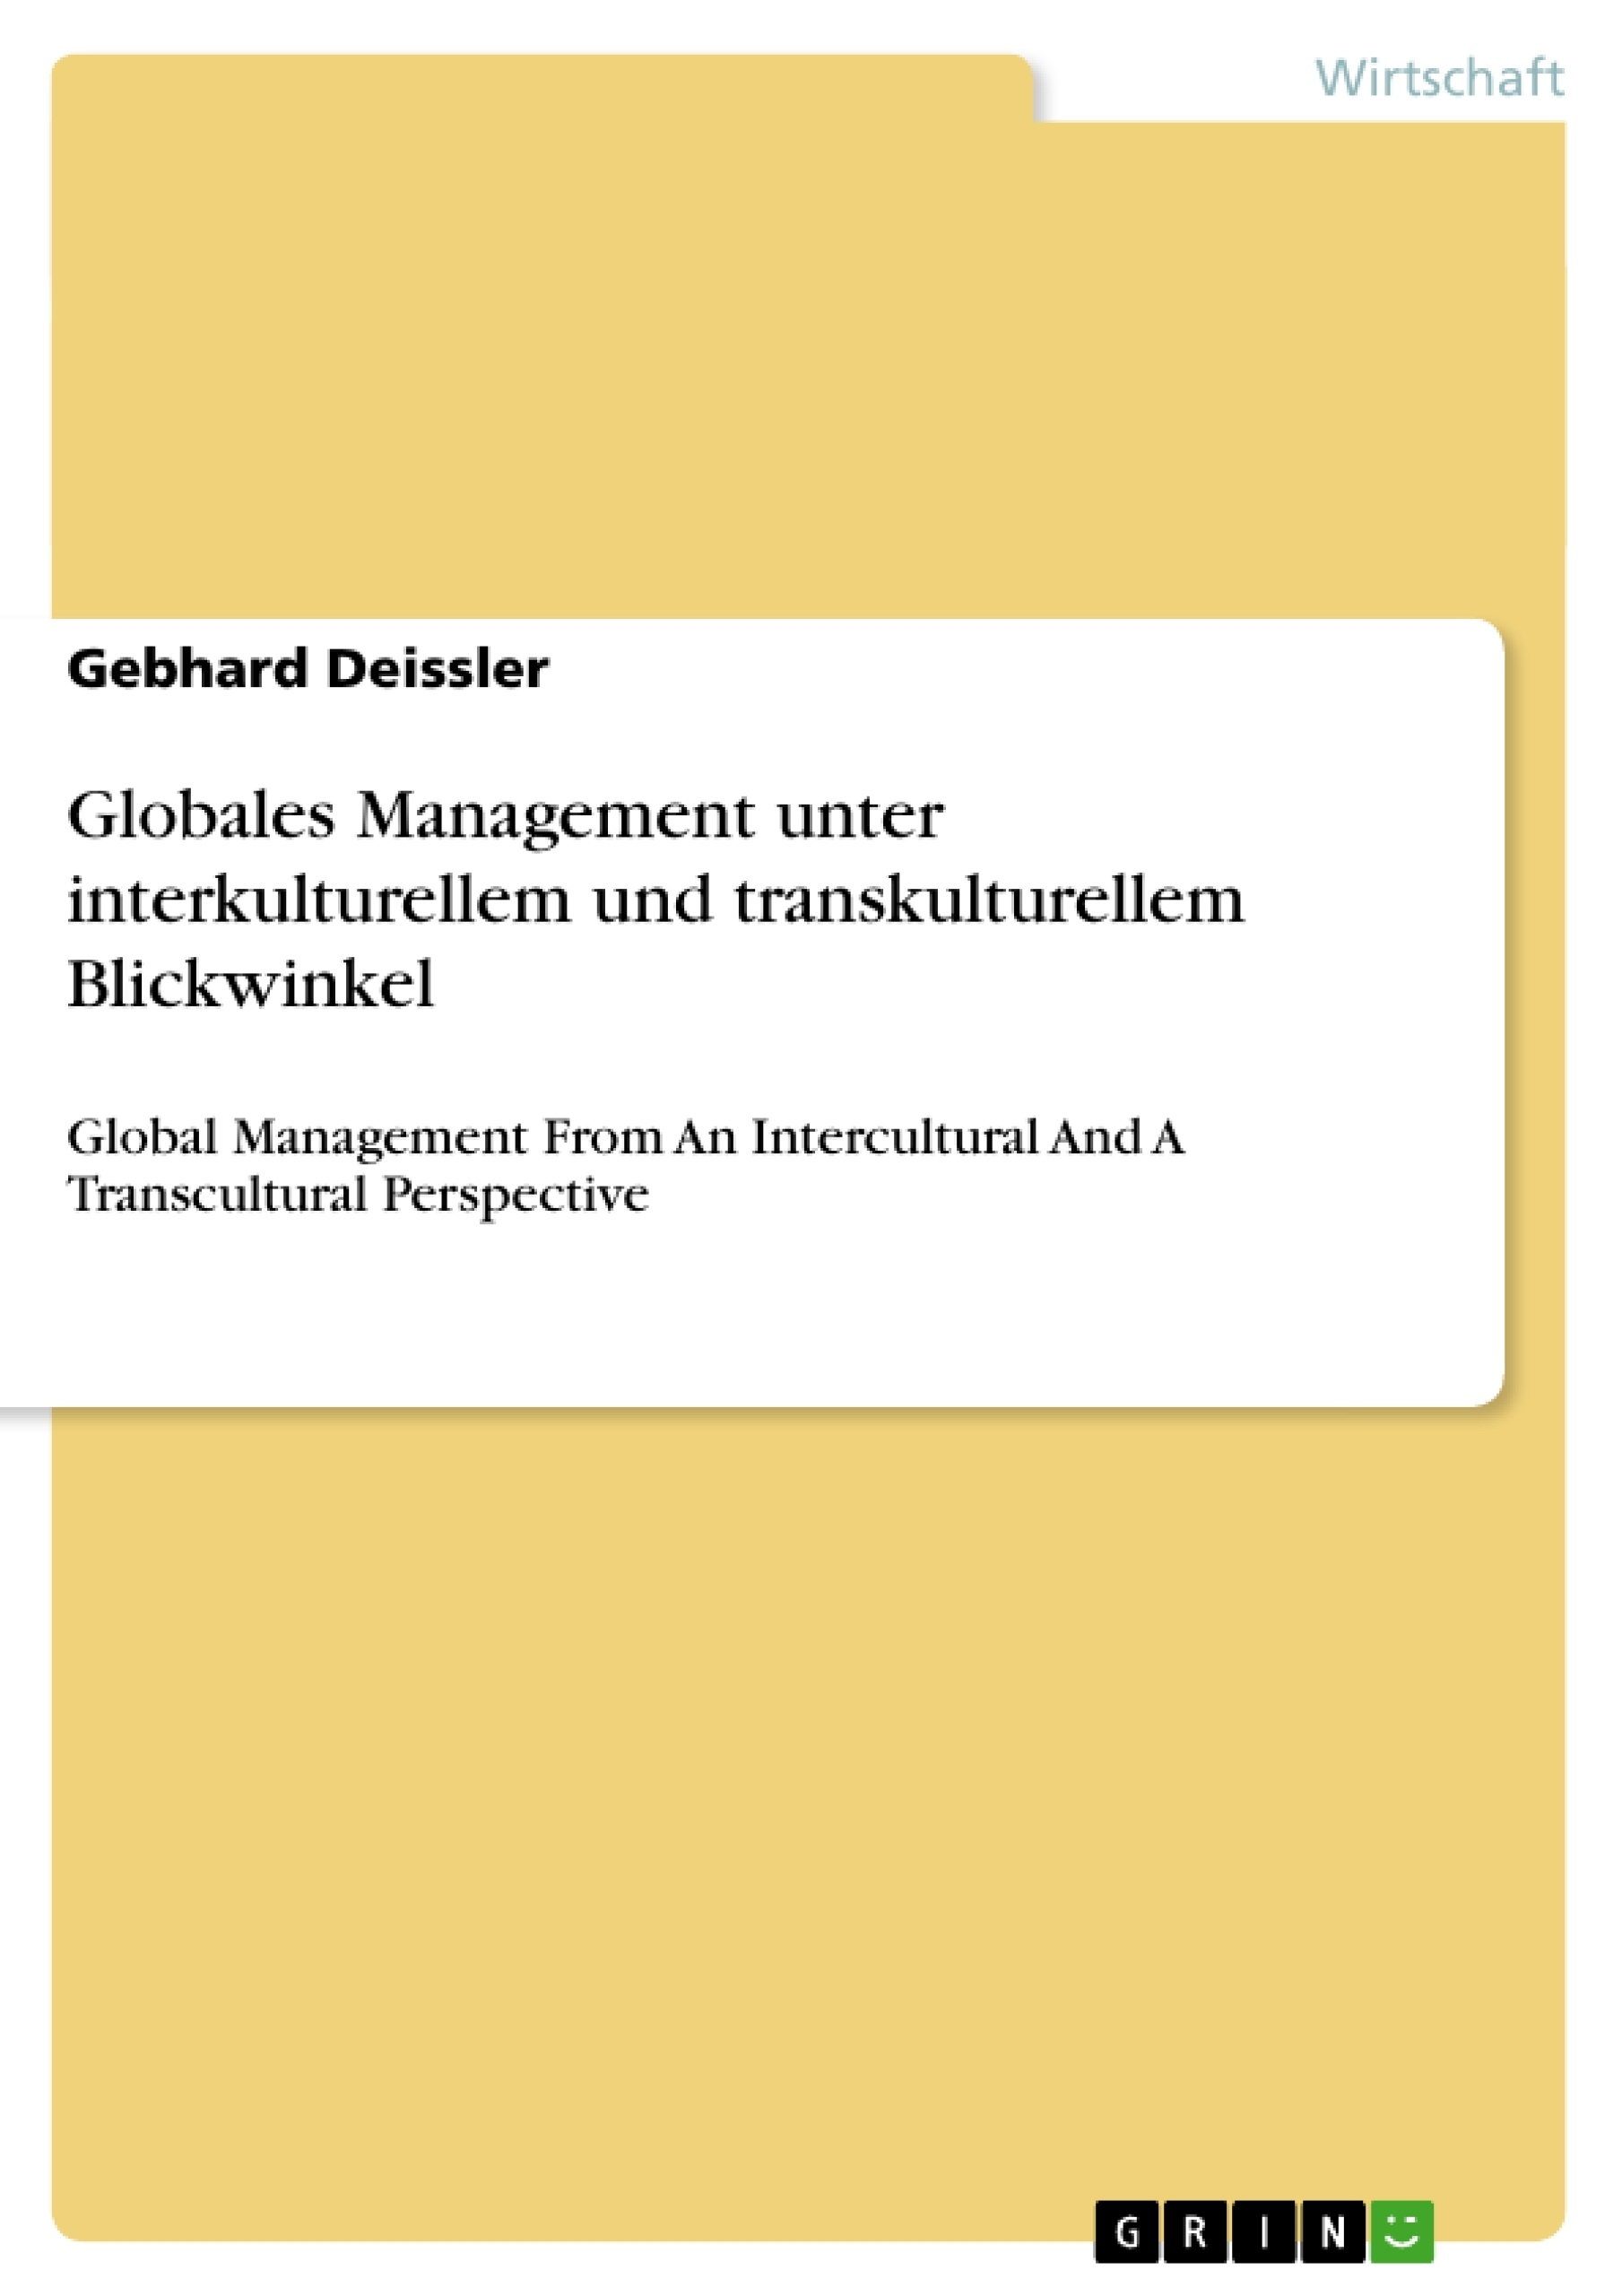 Titel: Globales Management unter interkulturellem und transkulturellem Blickwinkel